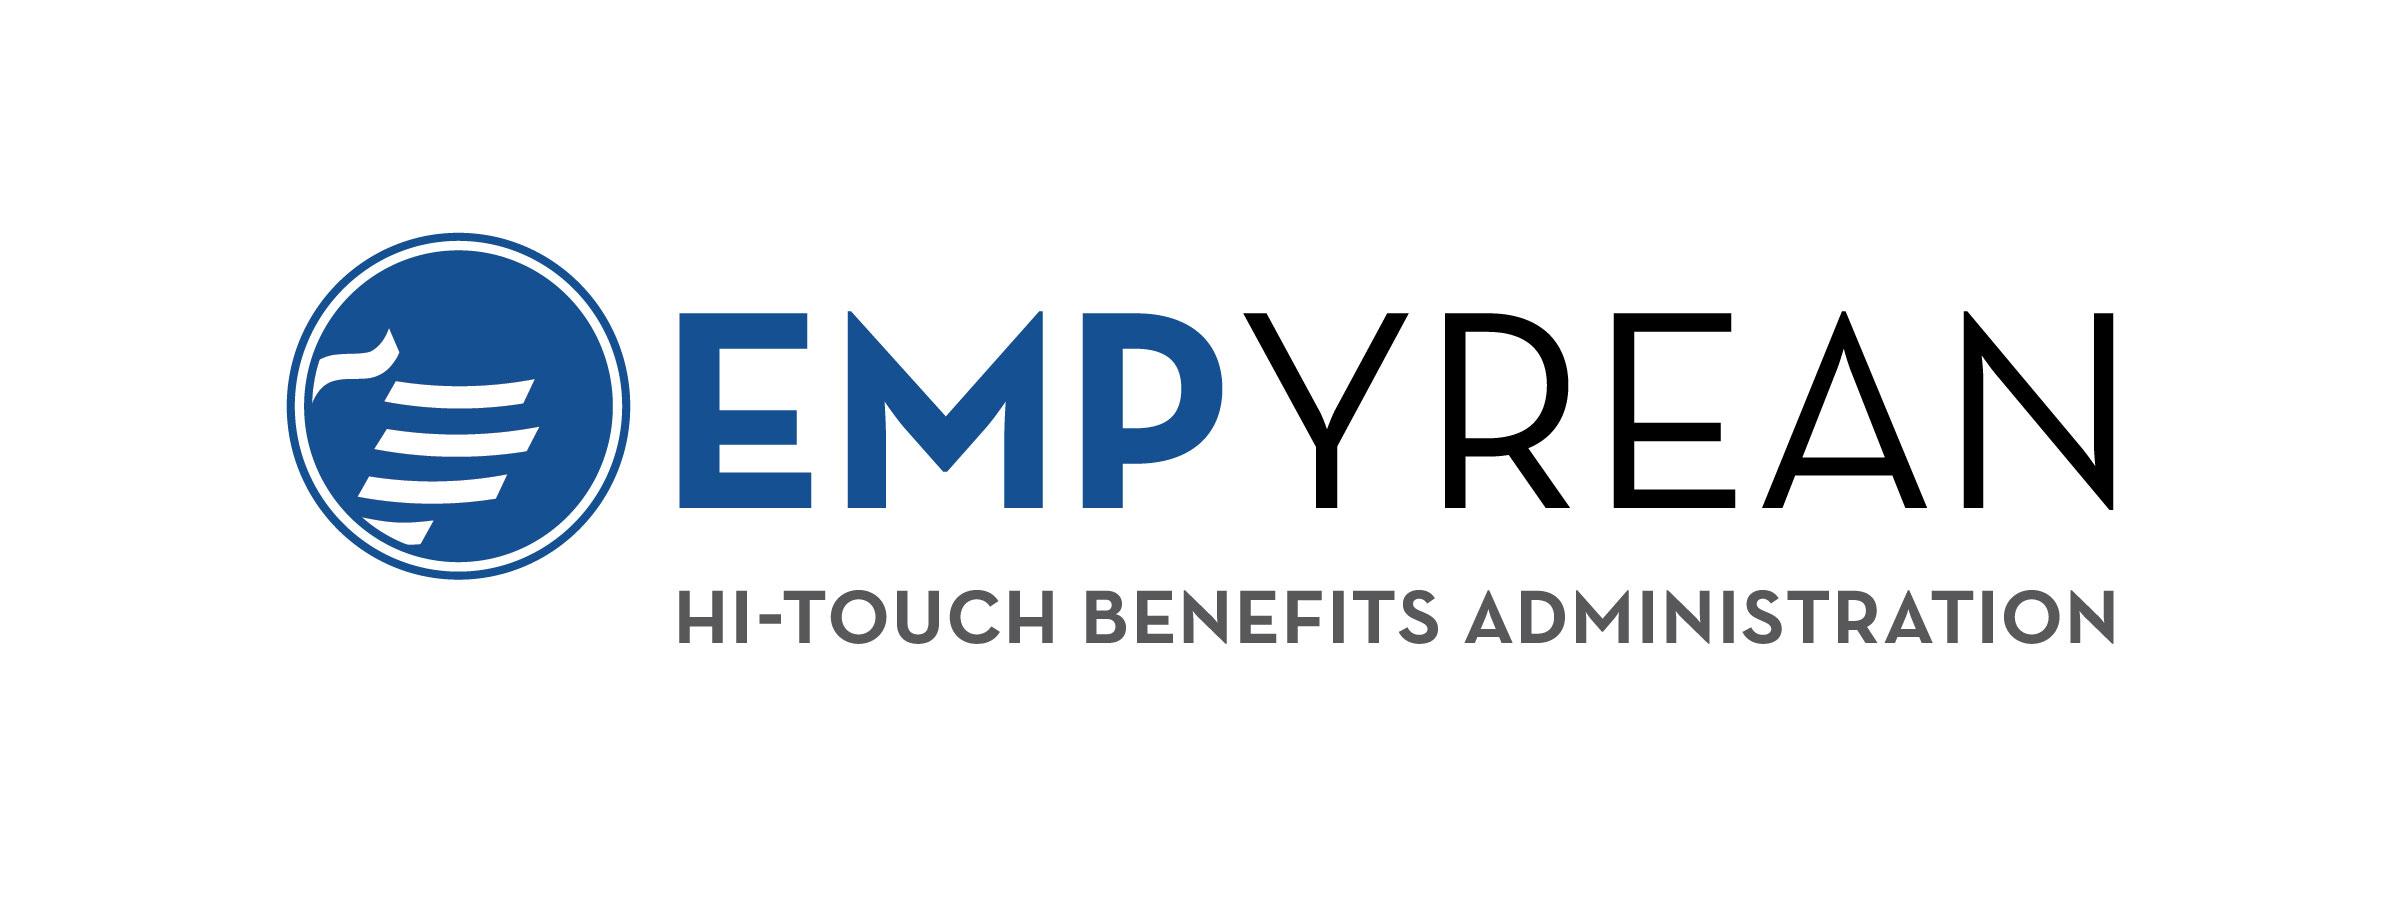 Empyrean Benefit Solutions, Inc.